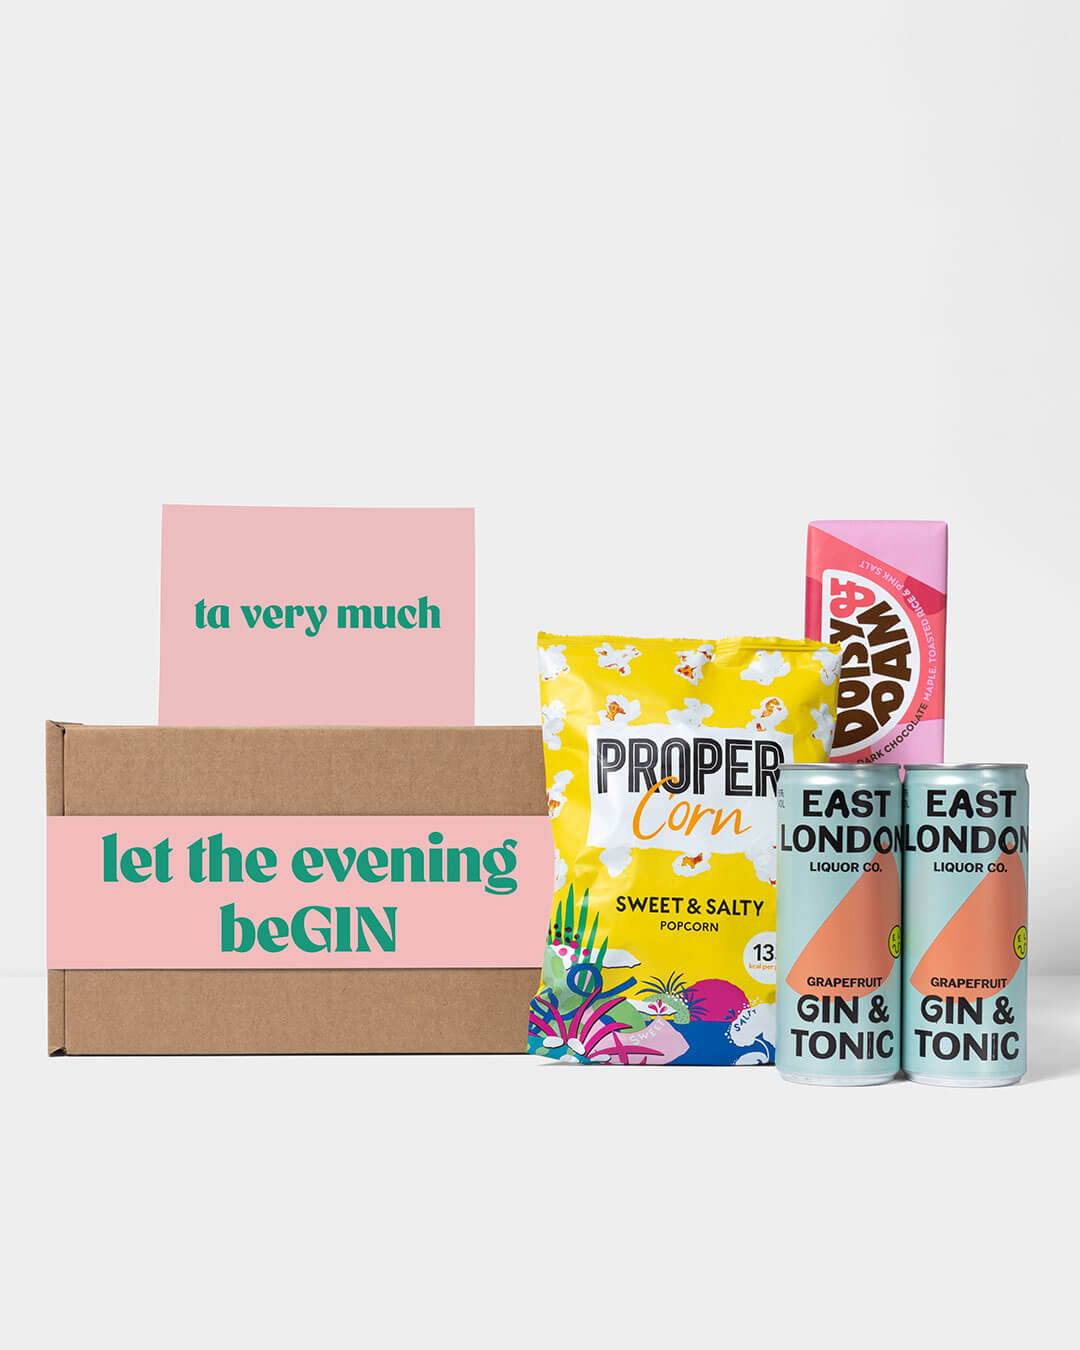 Spirit box including contents: 2 cans of Vodka & Rhubarb from East London Liquor, Propercorn pop corn & Doisy & Dam chocolate